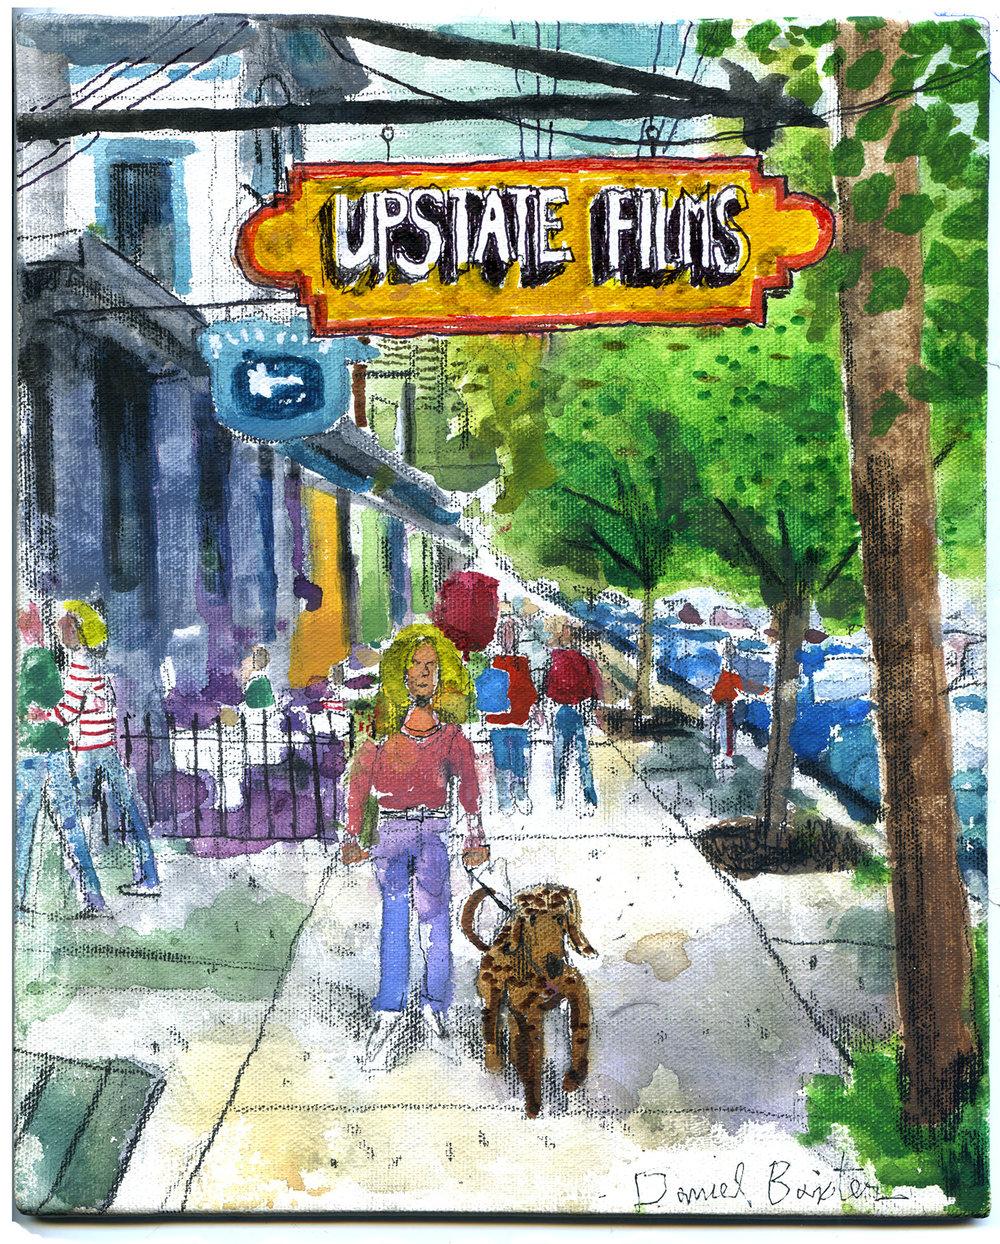 Upstate Films, Rhinebeck, NY